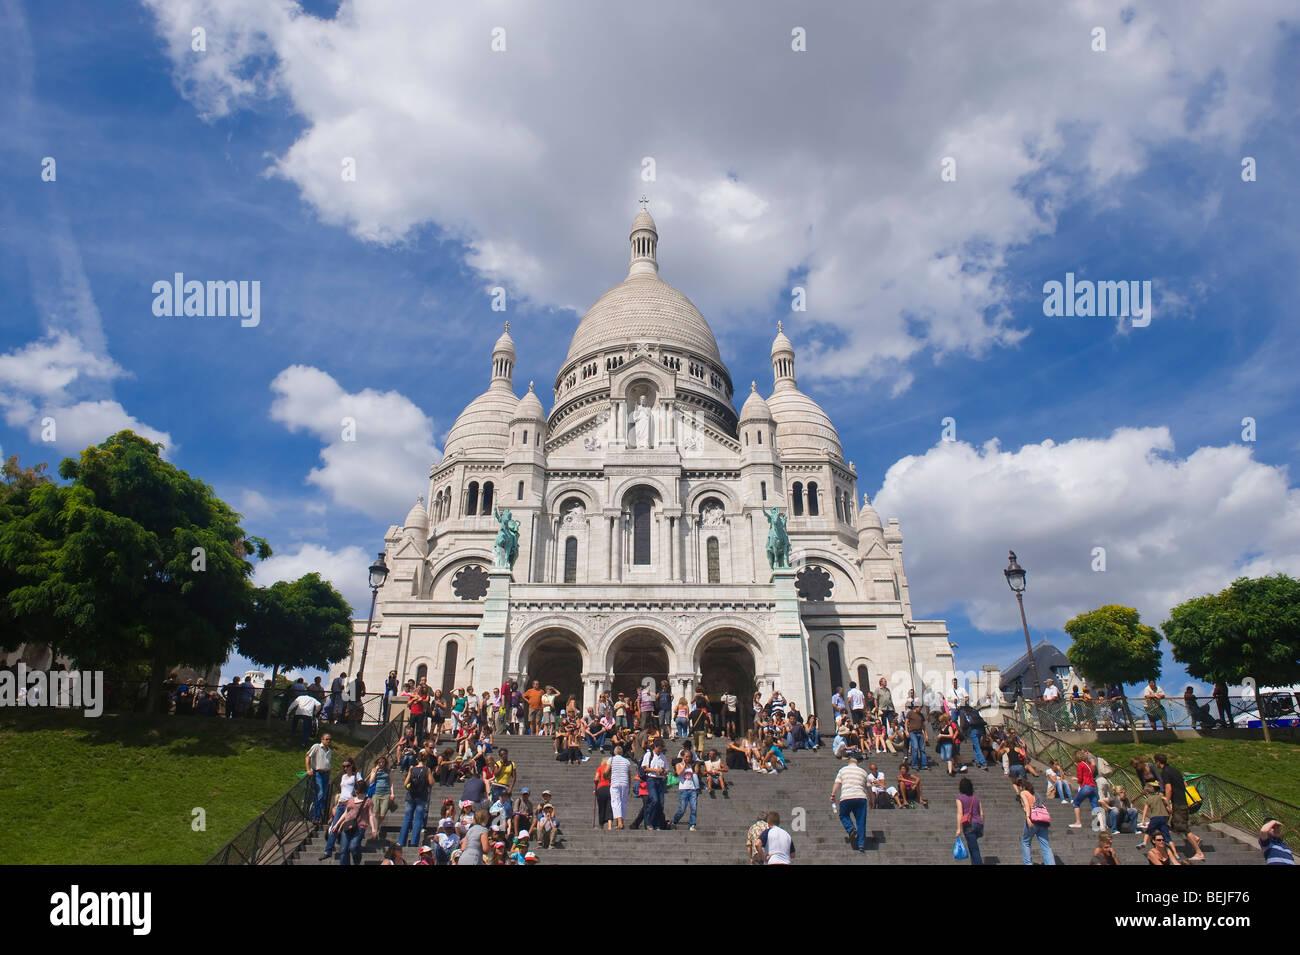 Basilica Sacre Coeur, Bell tower, Montmartre, Paris, France - Stock Image